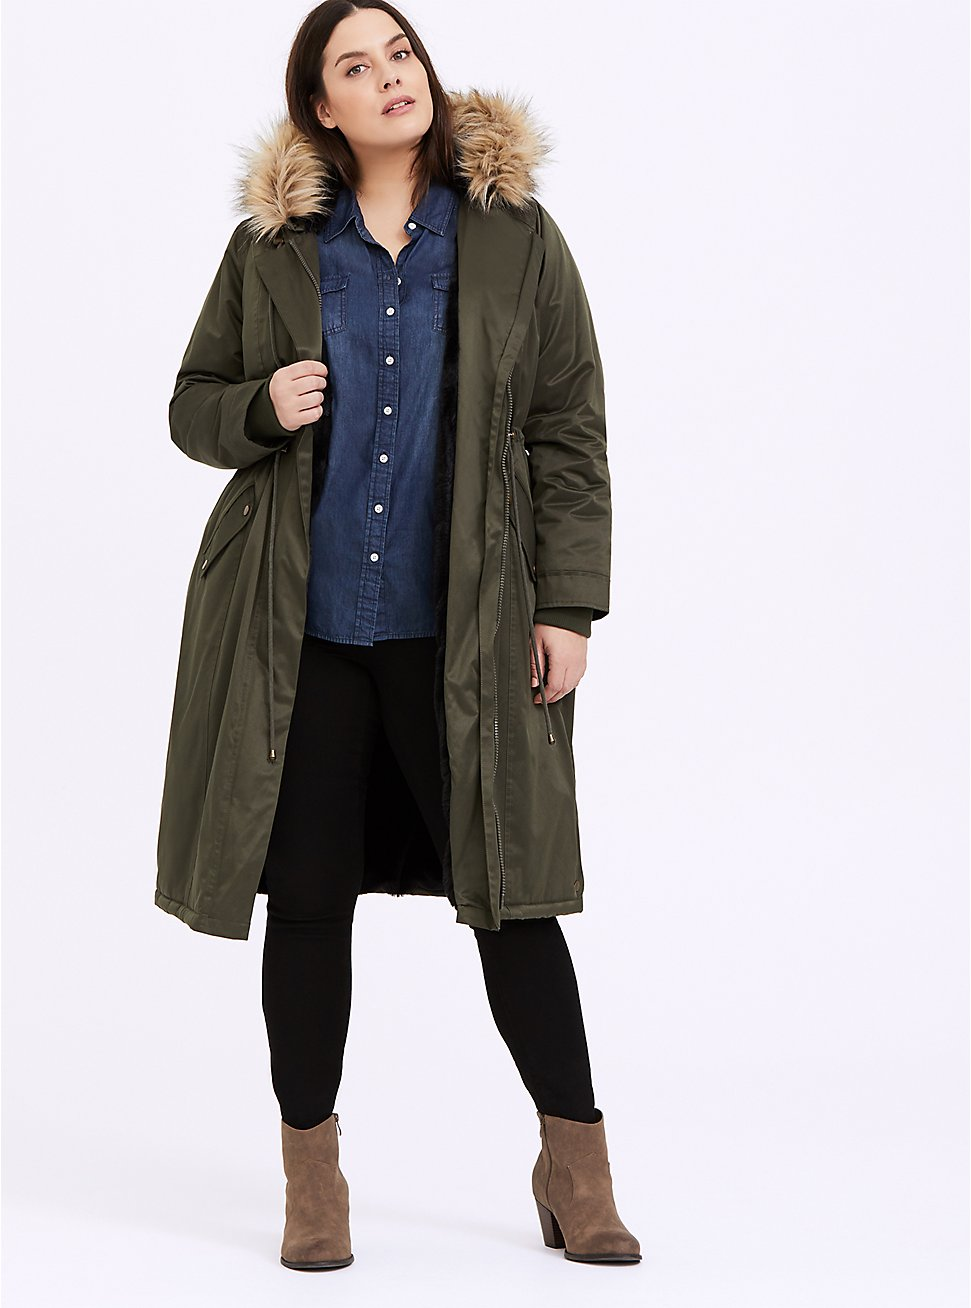 Olive Green Twill Faux Fur Hooded Longline Parka, DEEP DEPTHS, hi-res